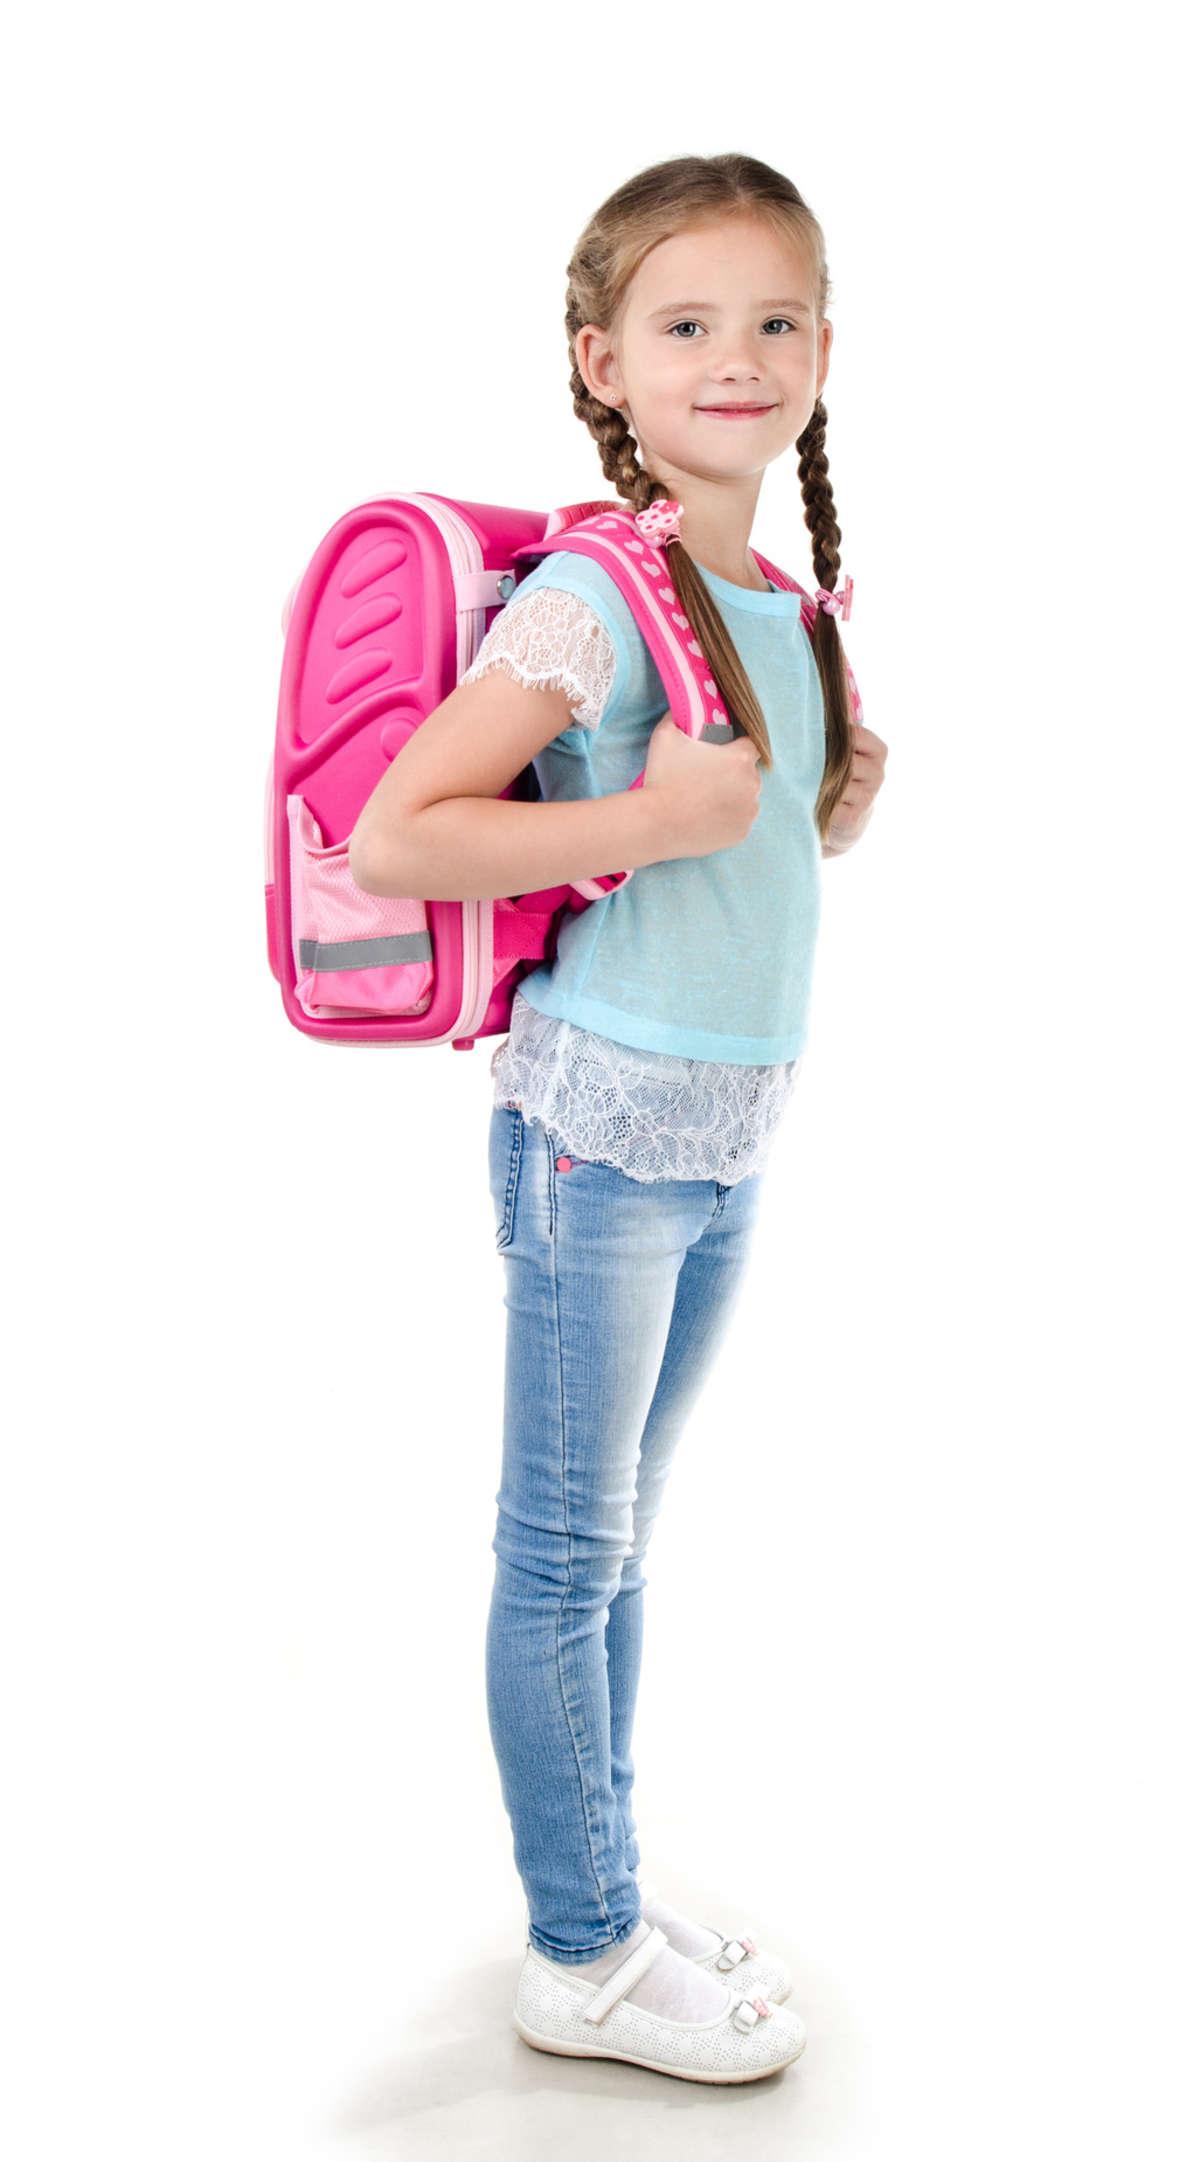 Co pierwszoklasista powinien mieć w plecaku? - full image